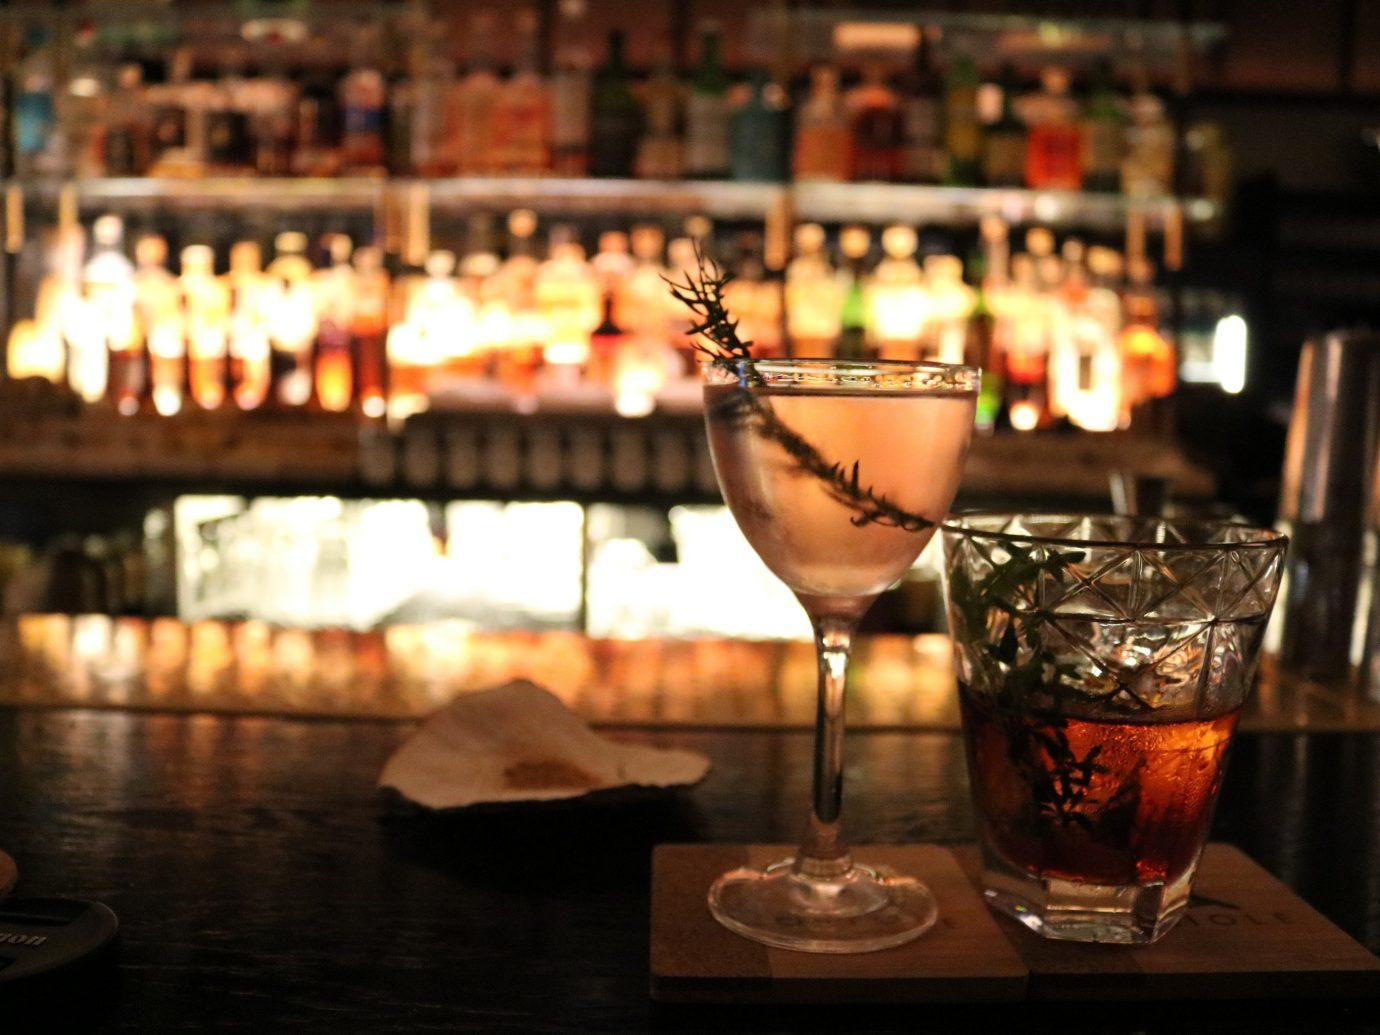 Budget Trip Ideas table indoor wine alcoholic beverage Bar Drink restaurant lighting cocktail